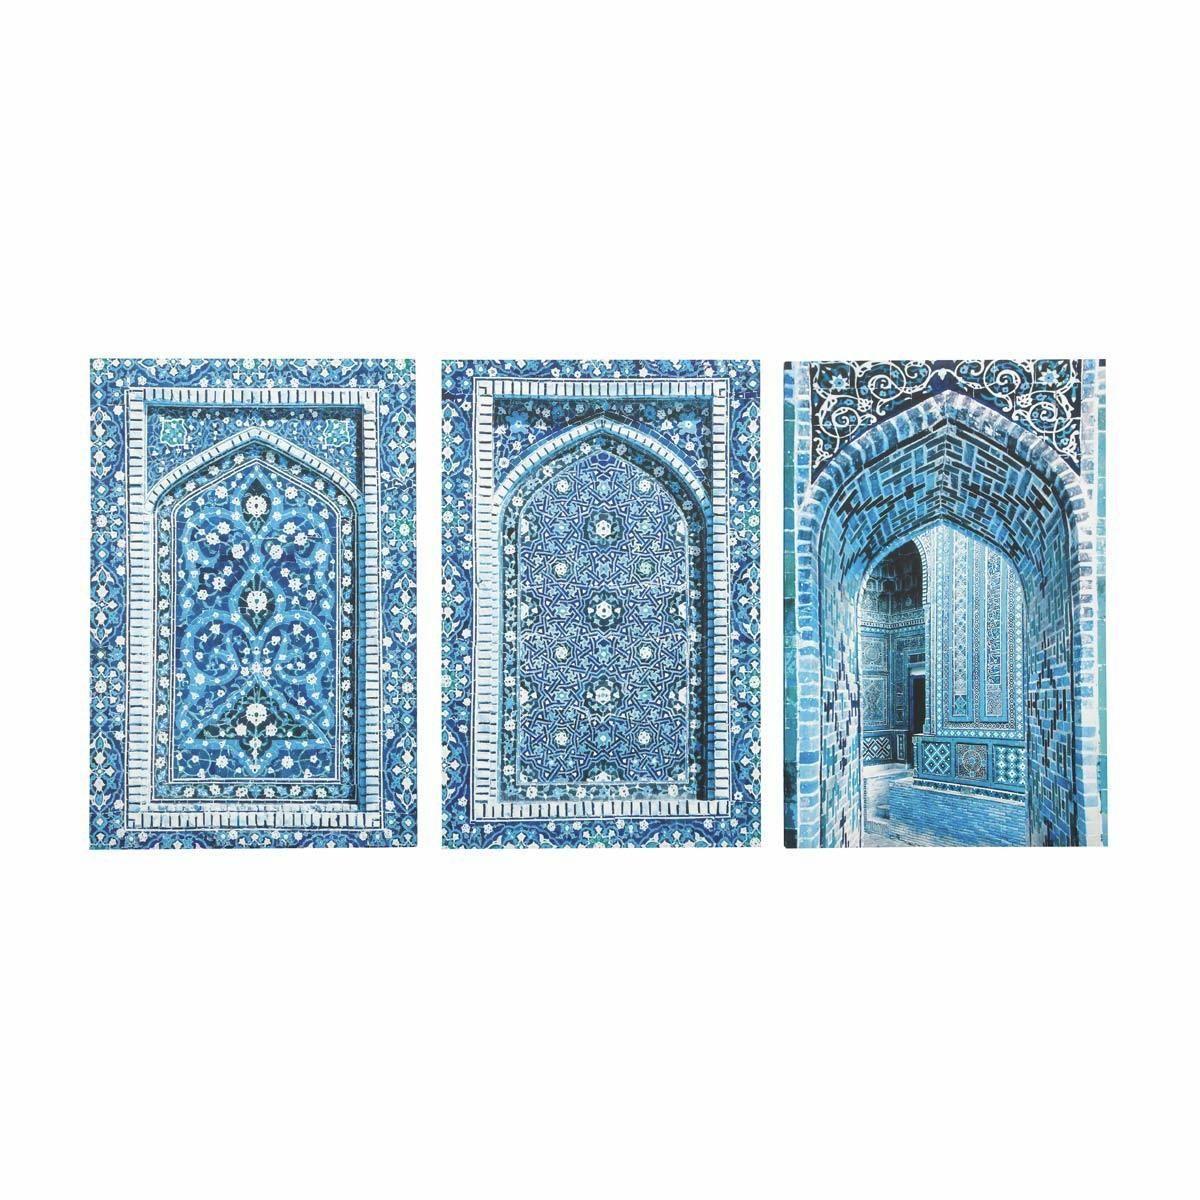 Miroir Marocain Maison Du Monde Maison Monde Miroir Idees De